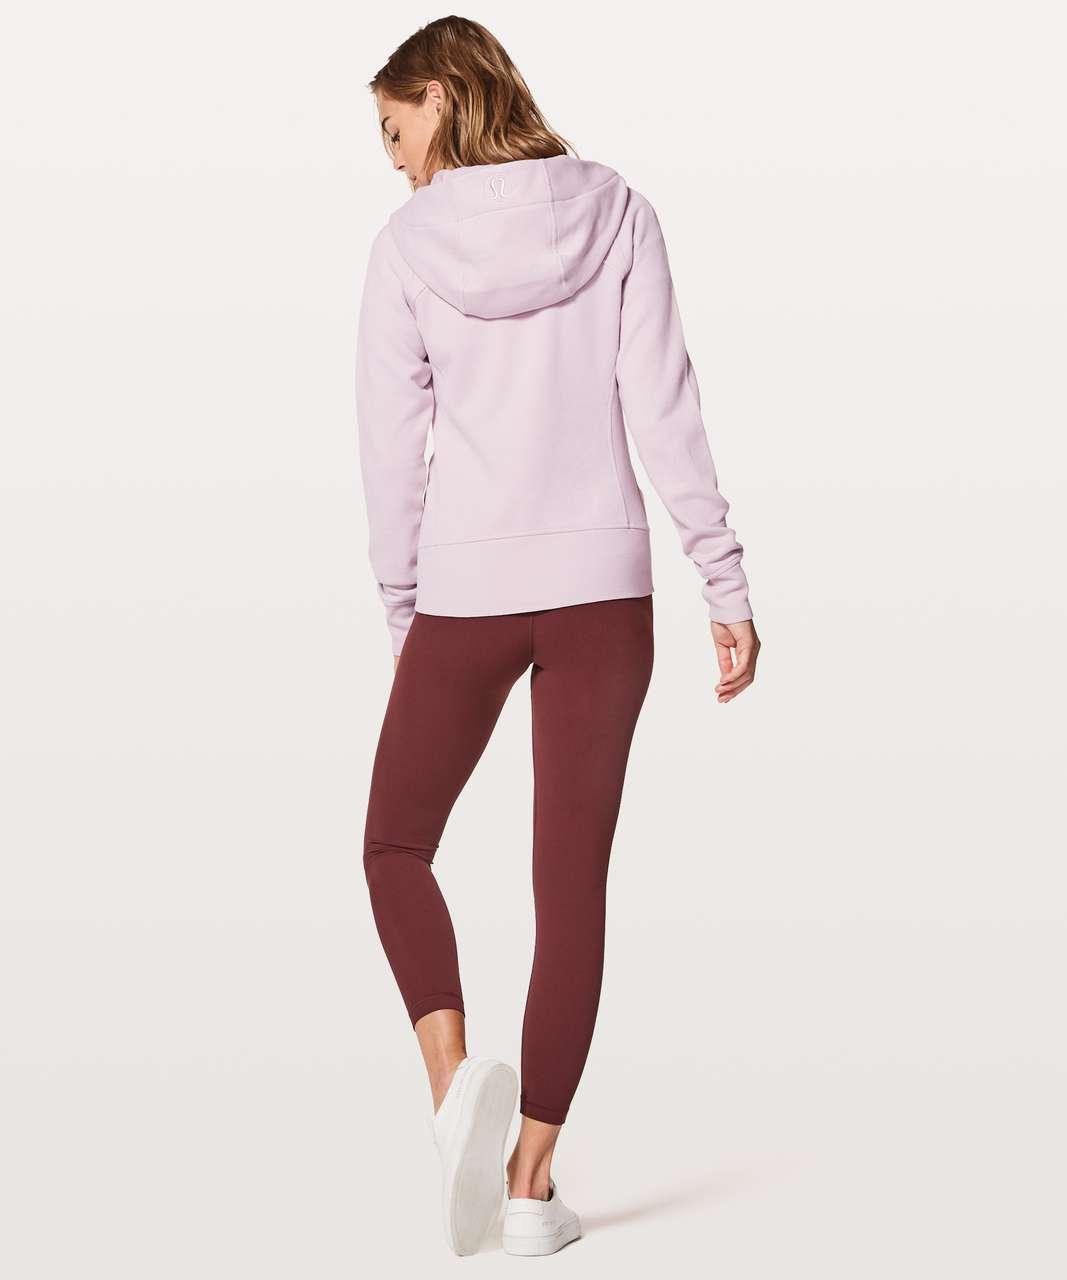 Lululemon Scuba Hoodie *Light Cotton Fleece - Porcelain Pink